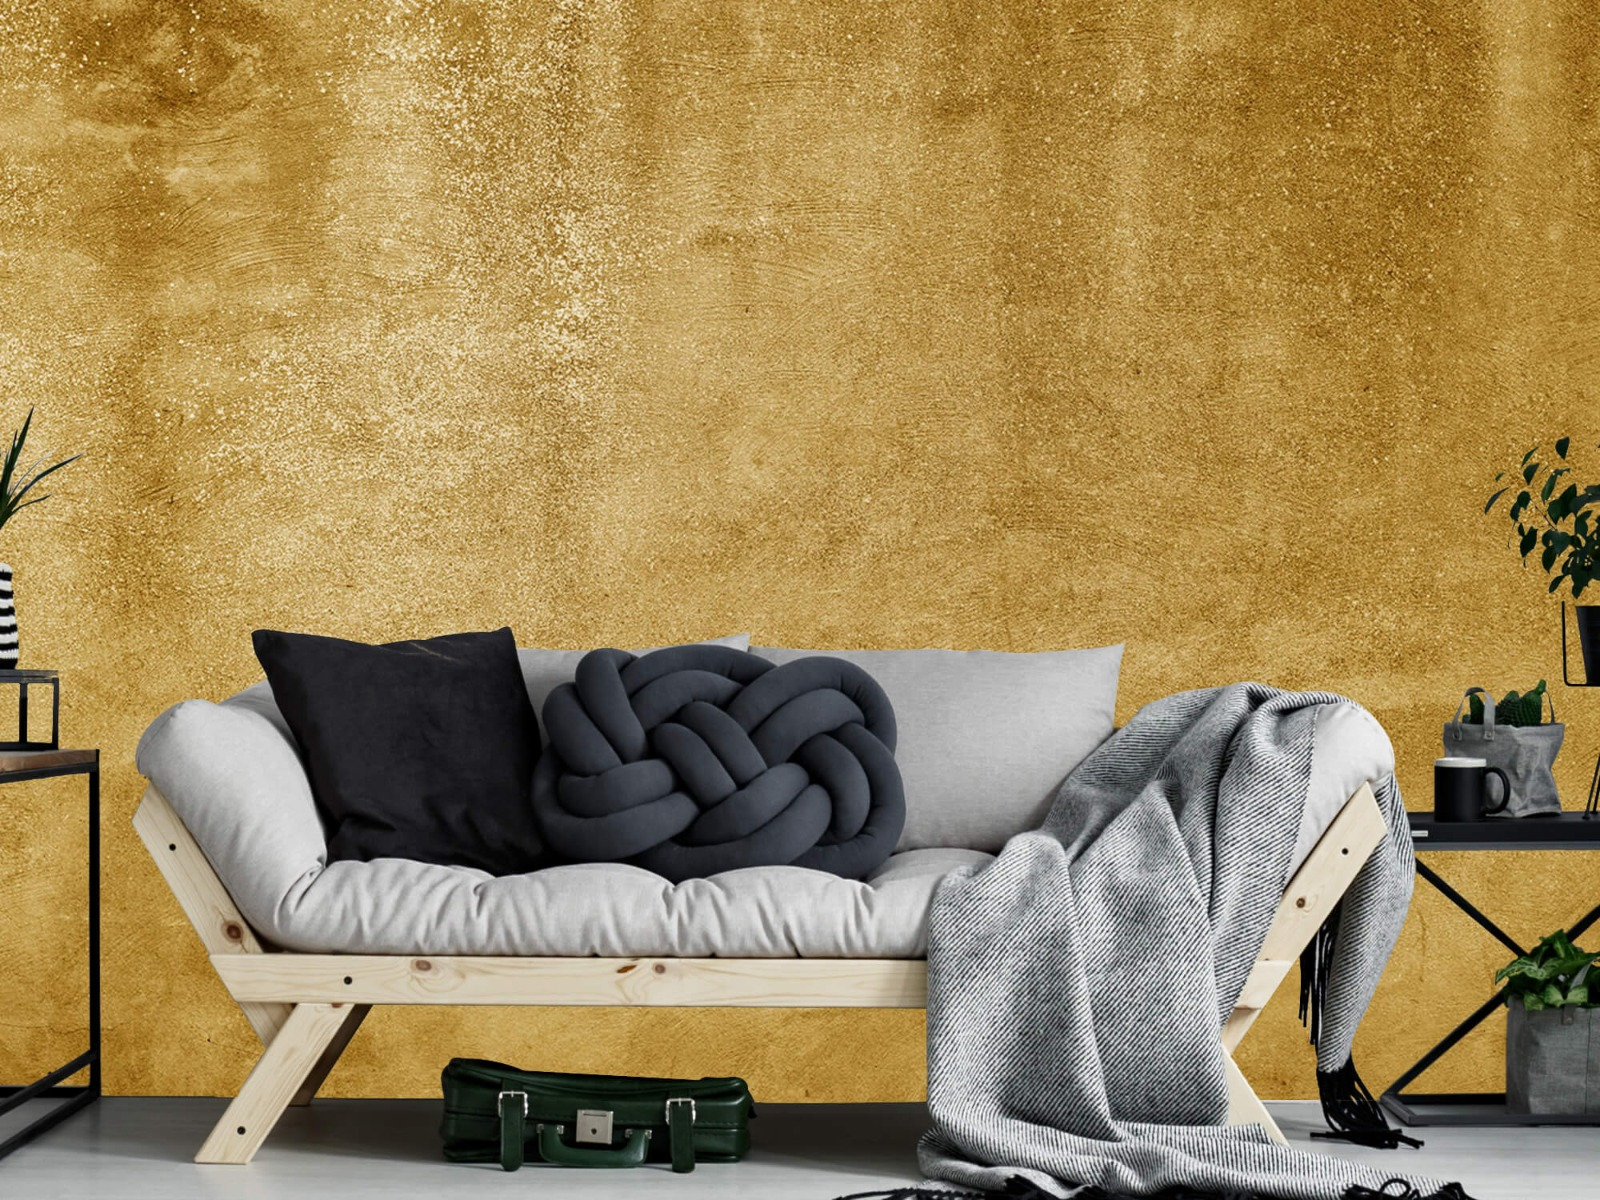 Betonlook behang - Oker geel beton - Woonkamer 7